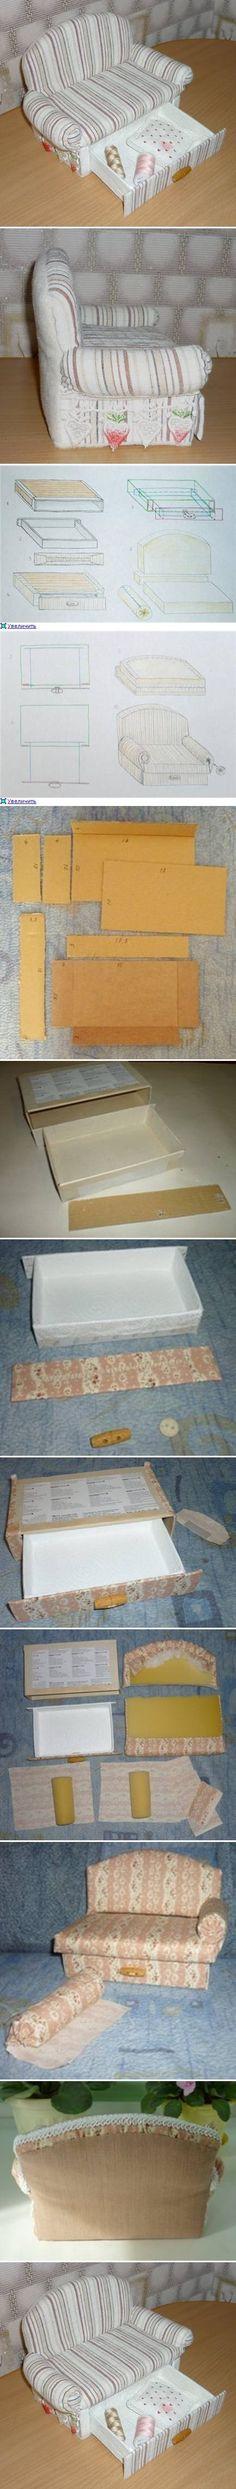 DIY Cardboard Sofa with Drawer